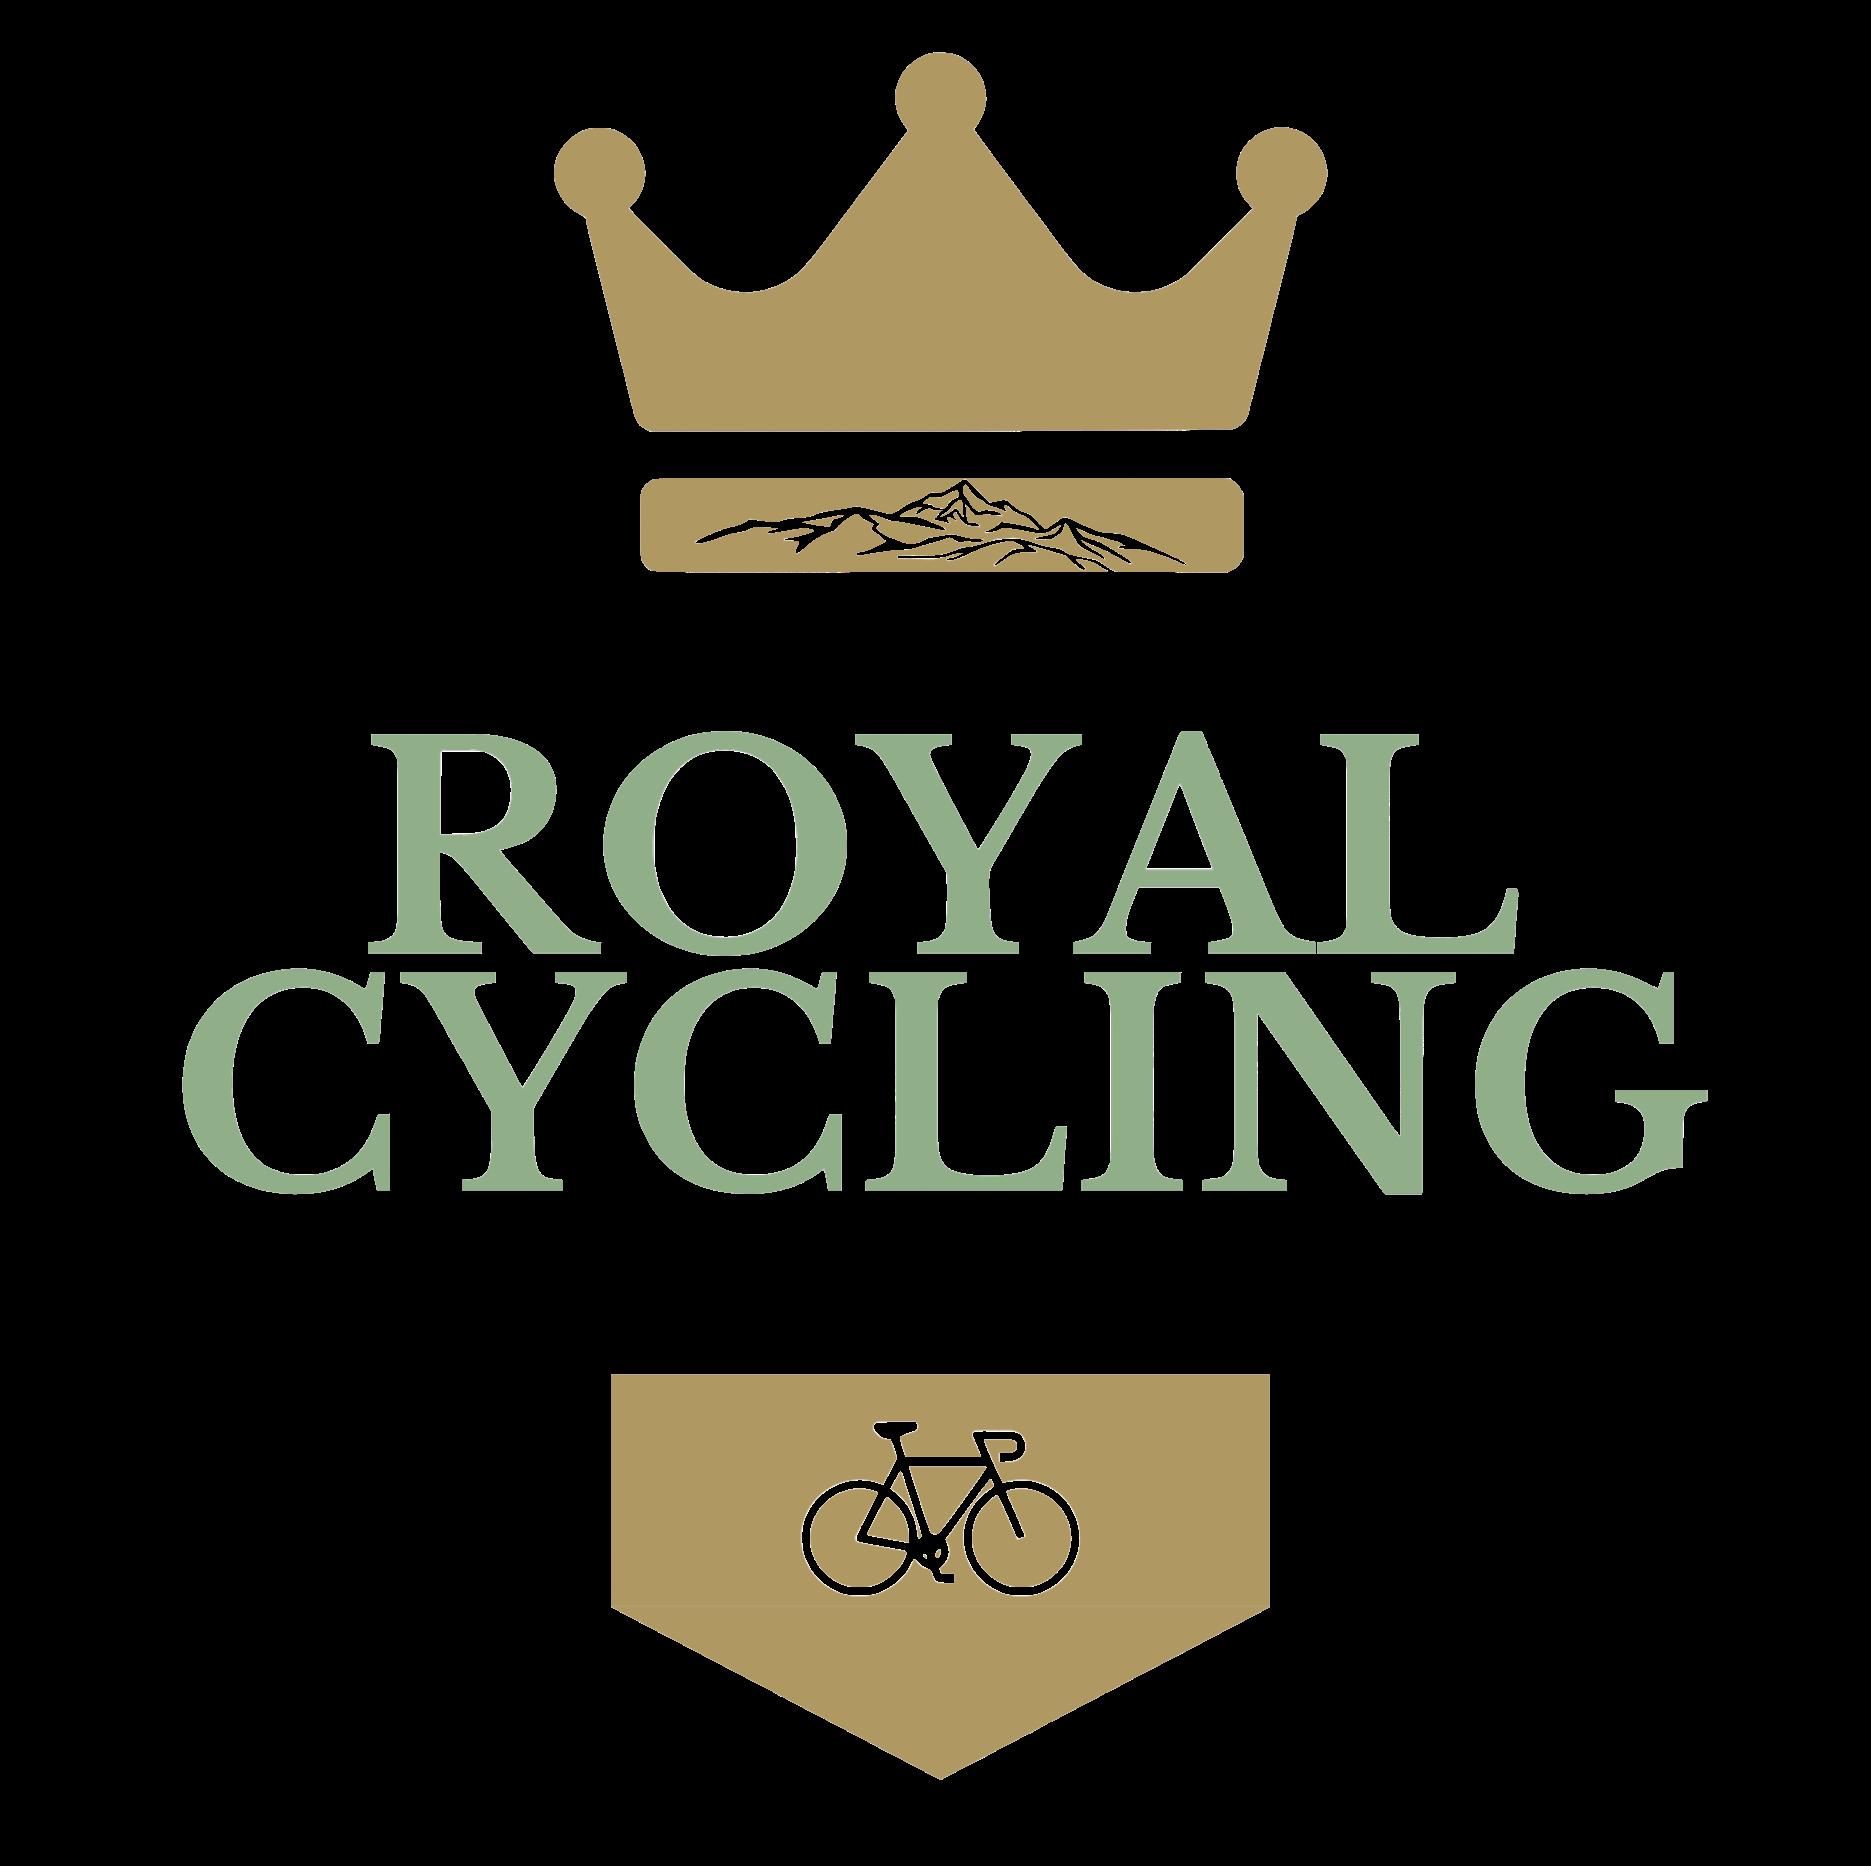 royal cycling experience